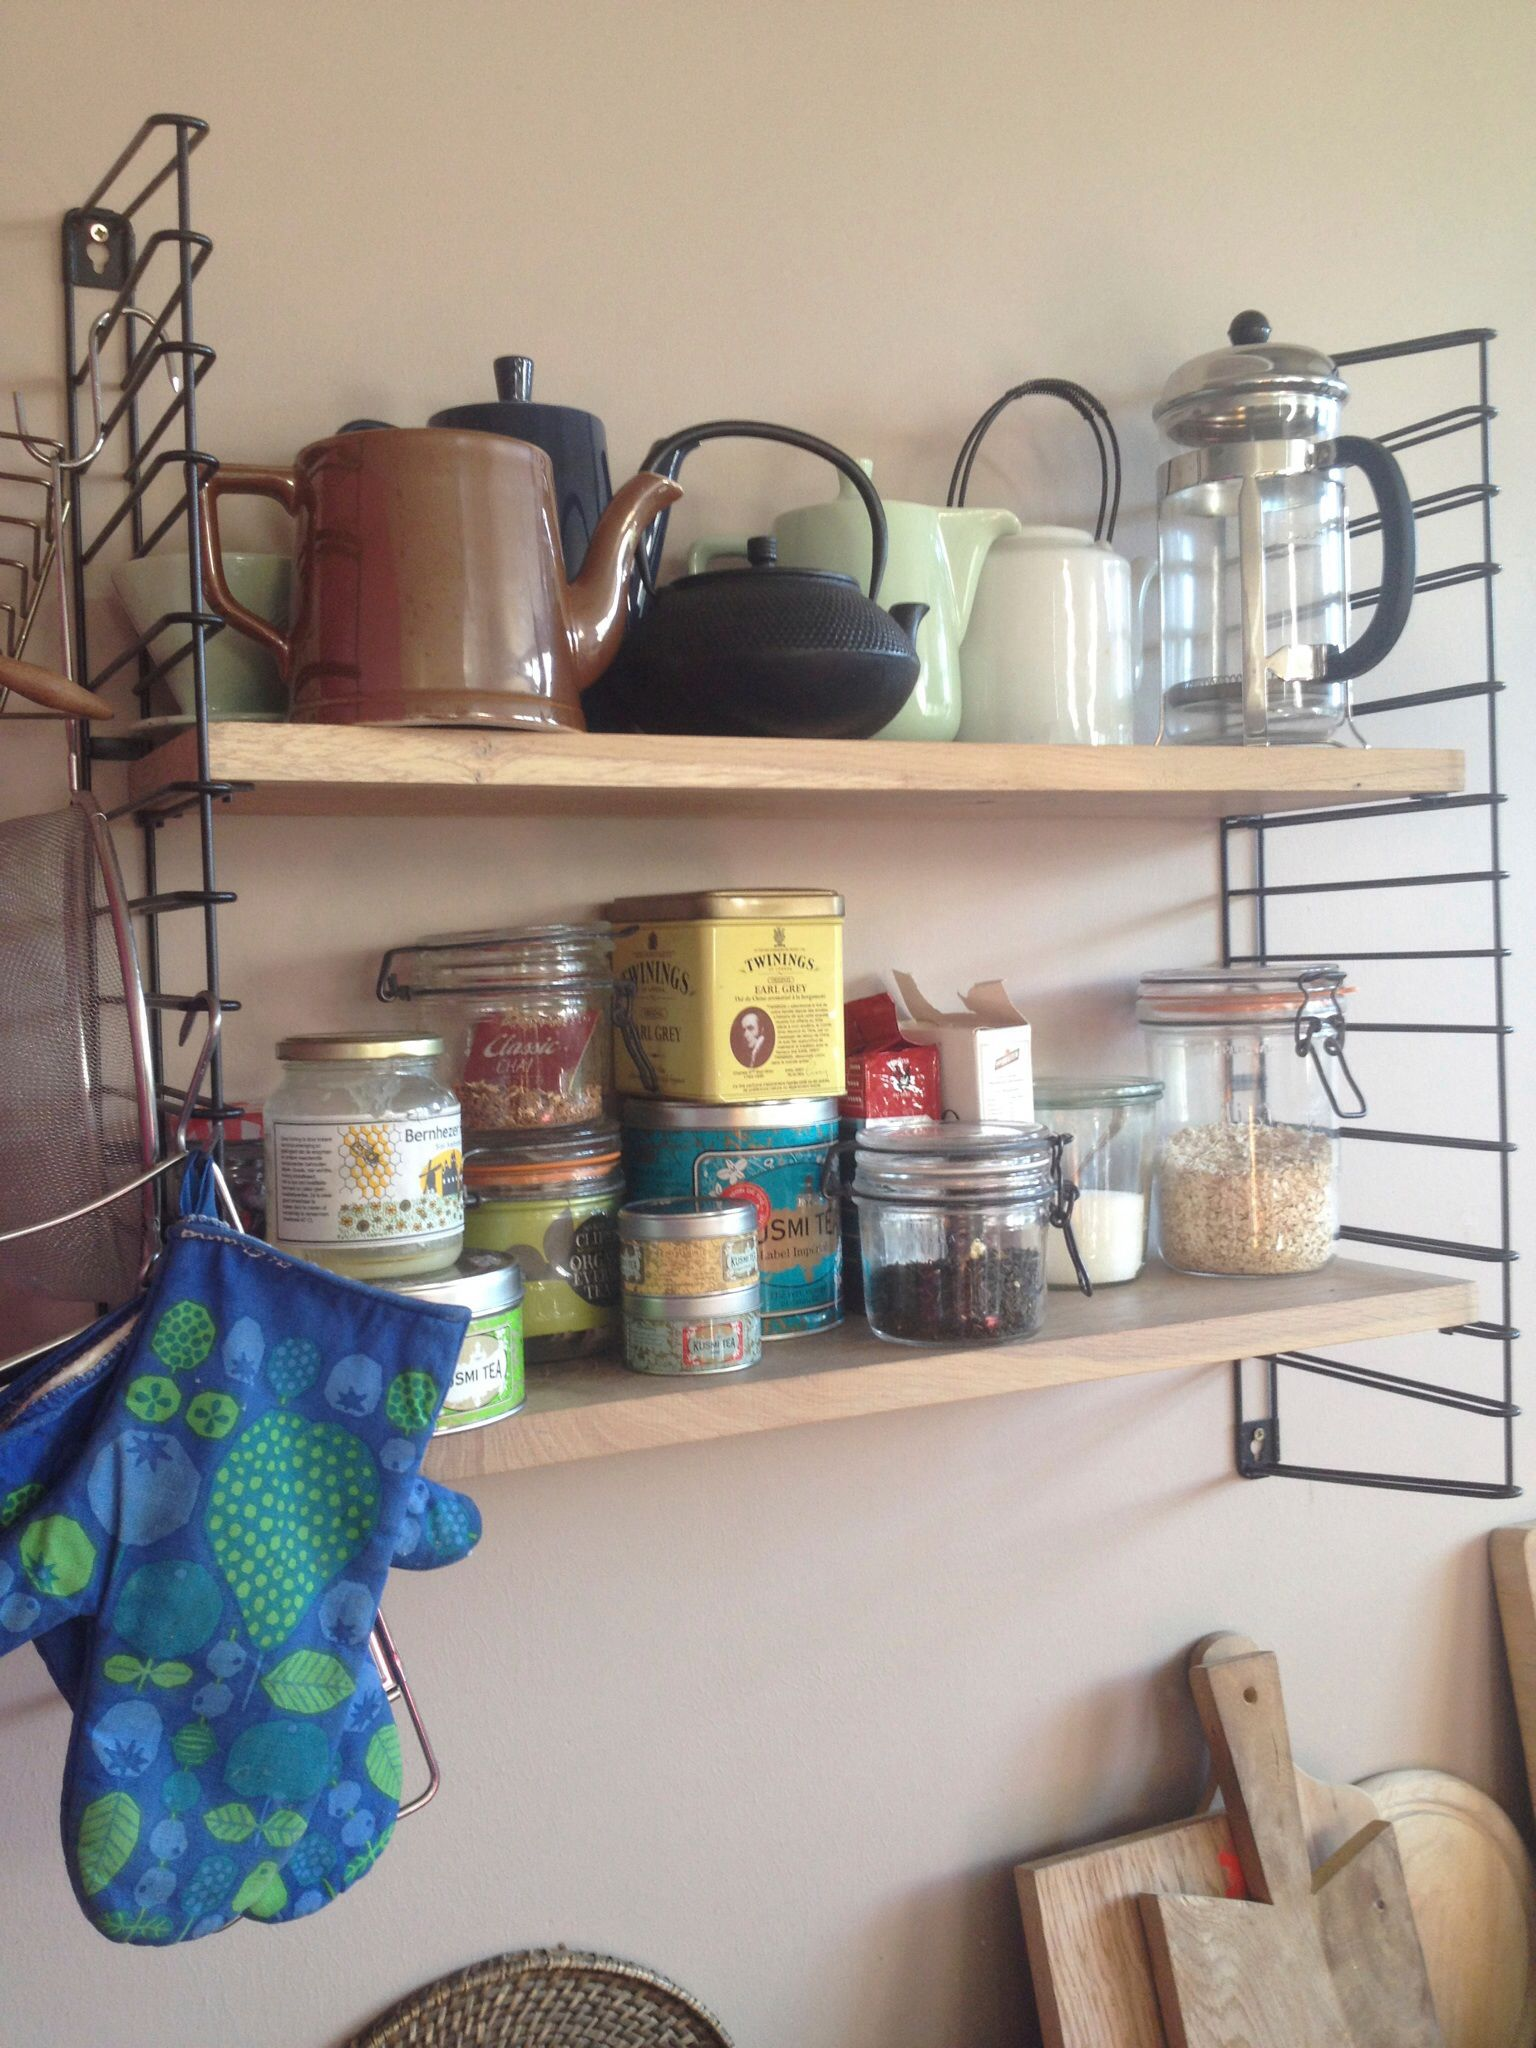 My vintage Tomado Kitchen Shelves, with my addition of oak shelves.